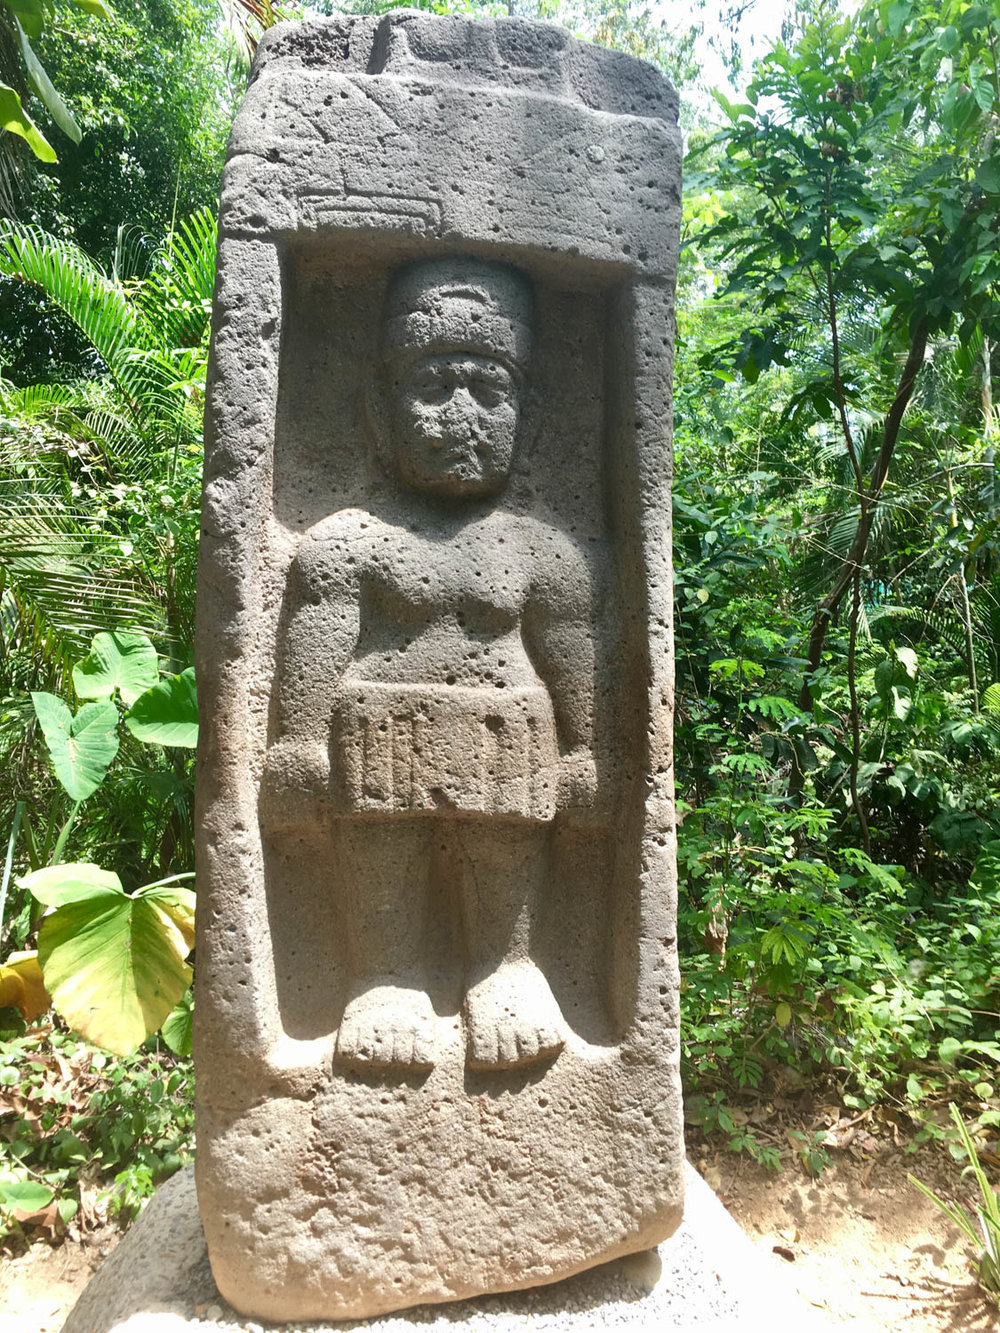 A female Olmec at La Venta. A queen?